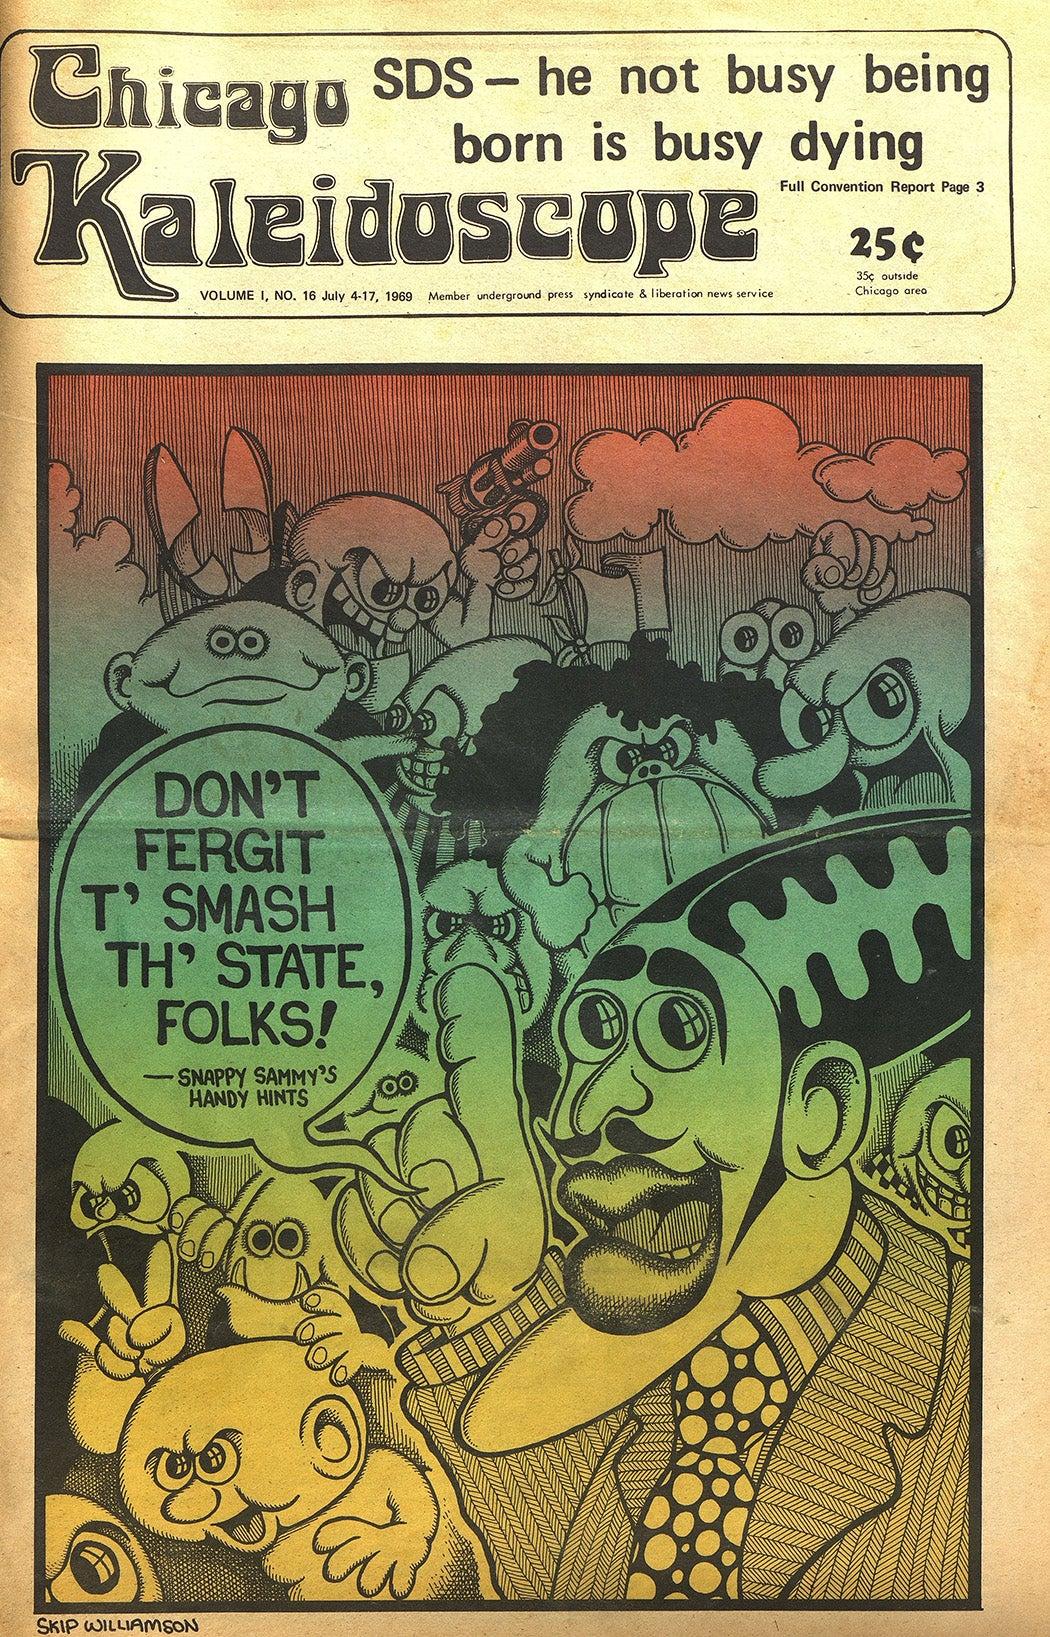 Kaleidoscope Chicago, July 4-17, 1969